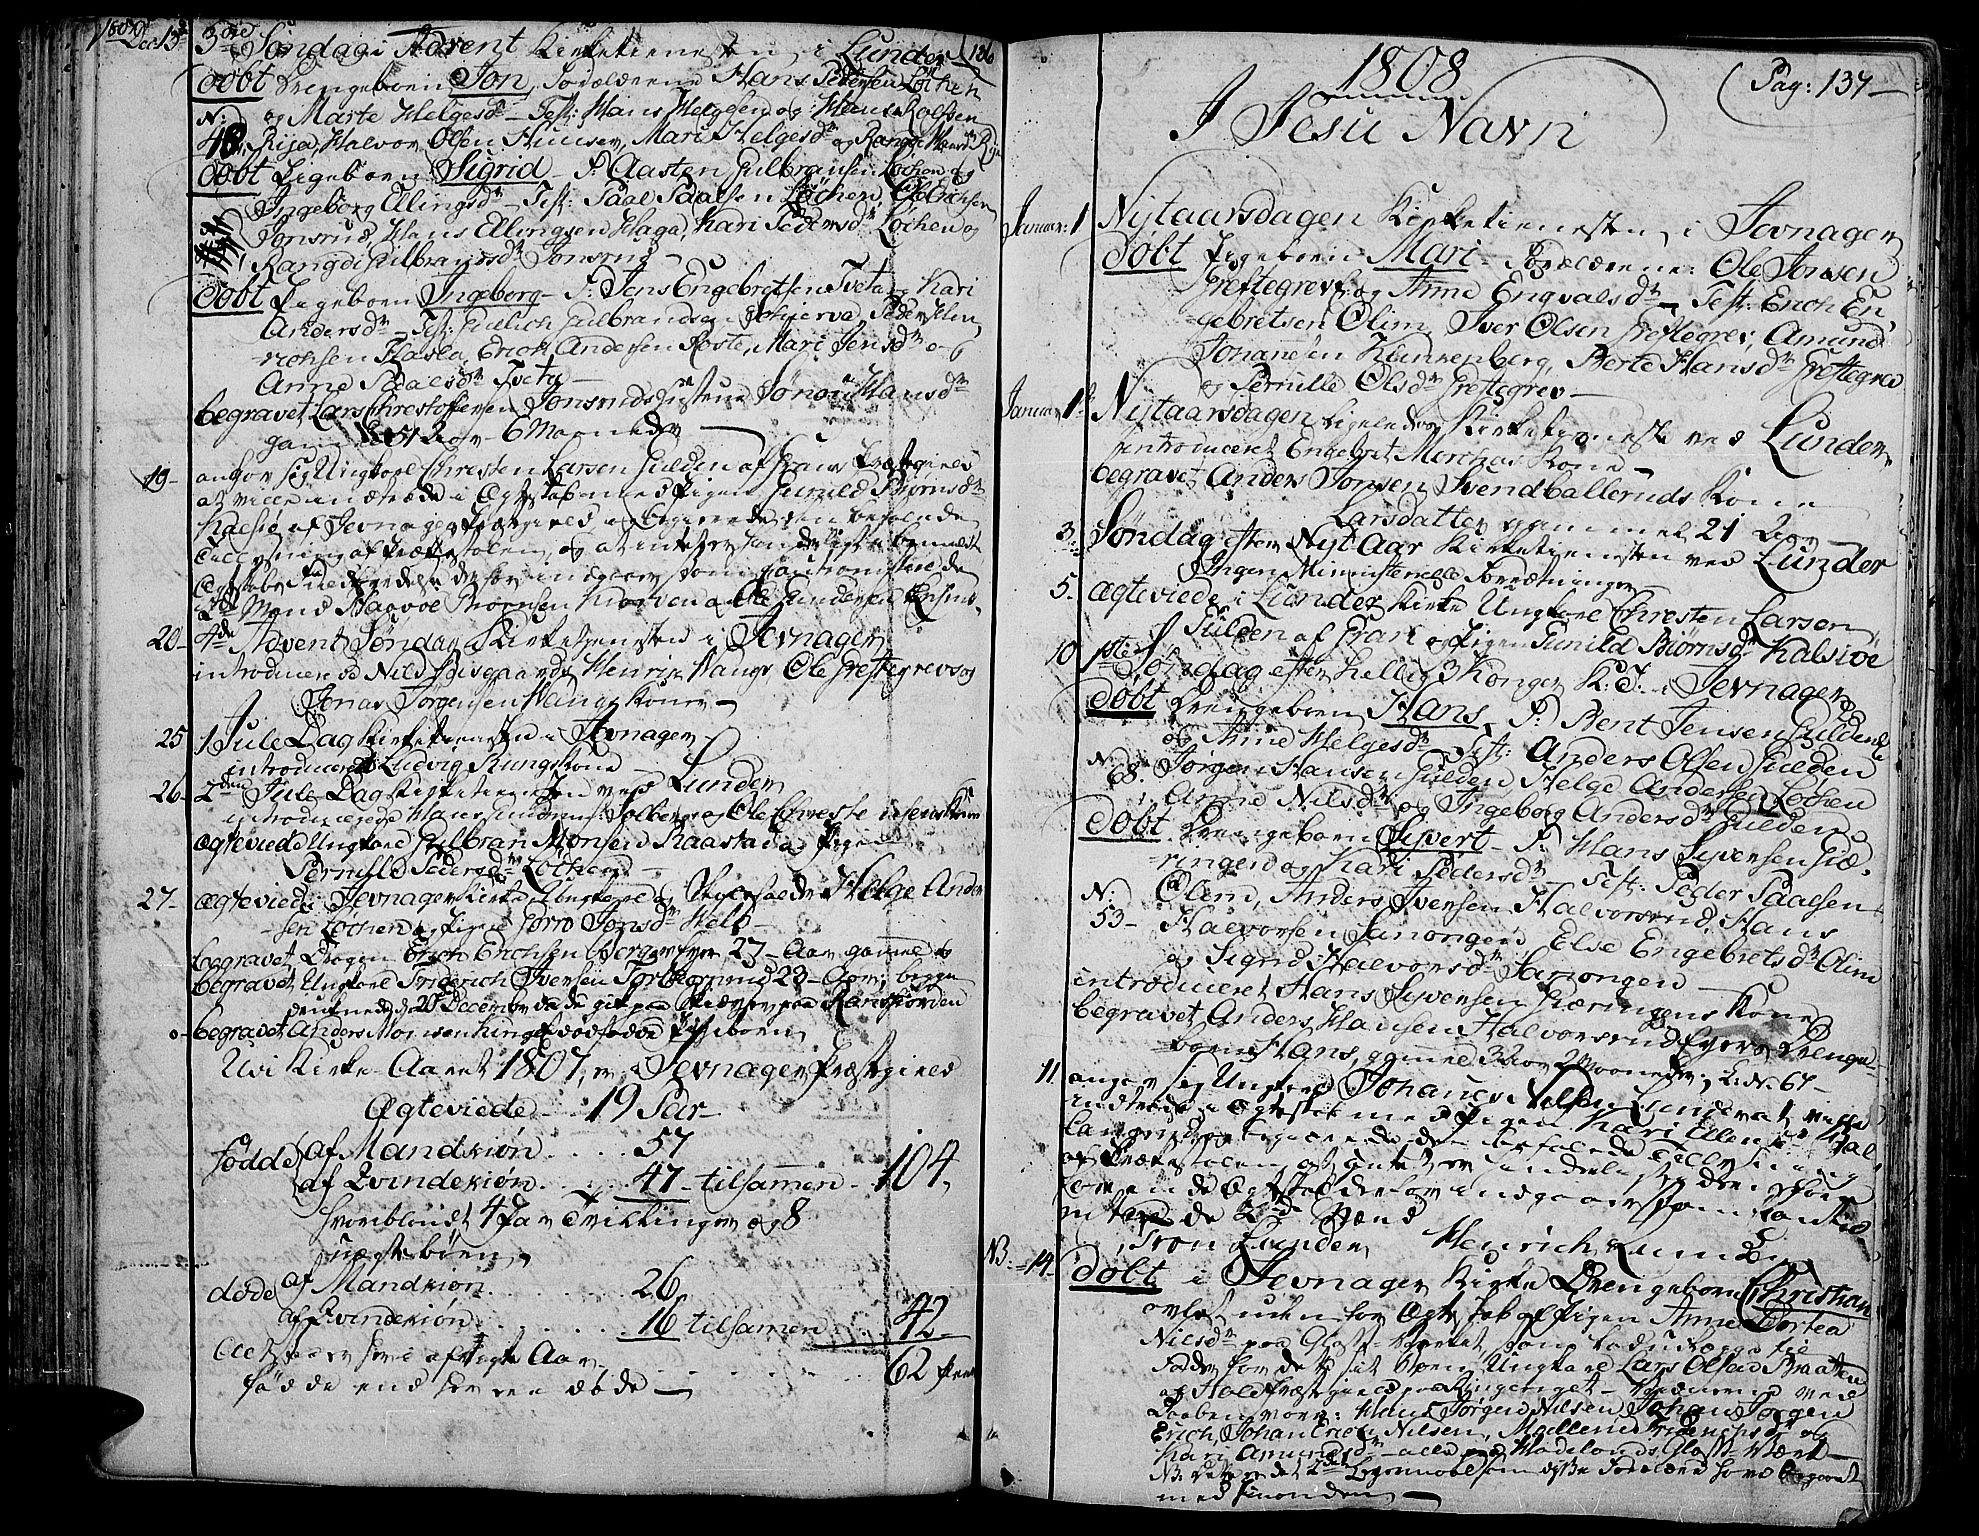 SAH, Jevnaker prestekontor, Ministerialbok nr. 4, 1800-1861, s. 136-137